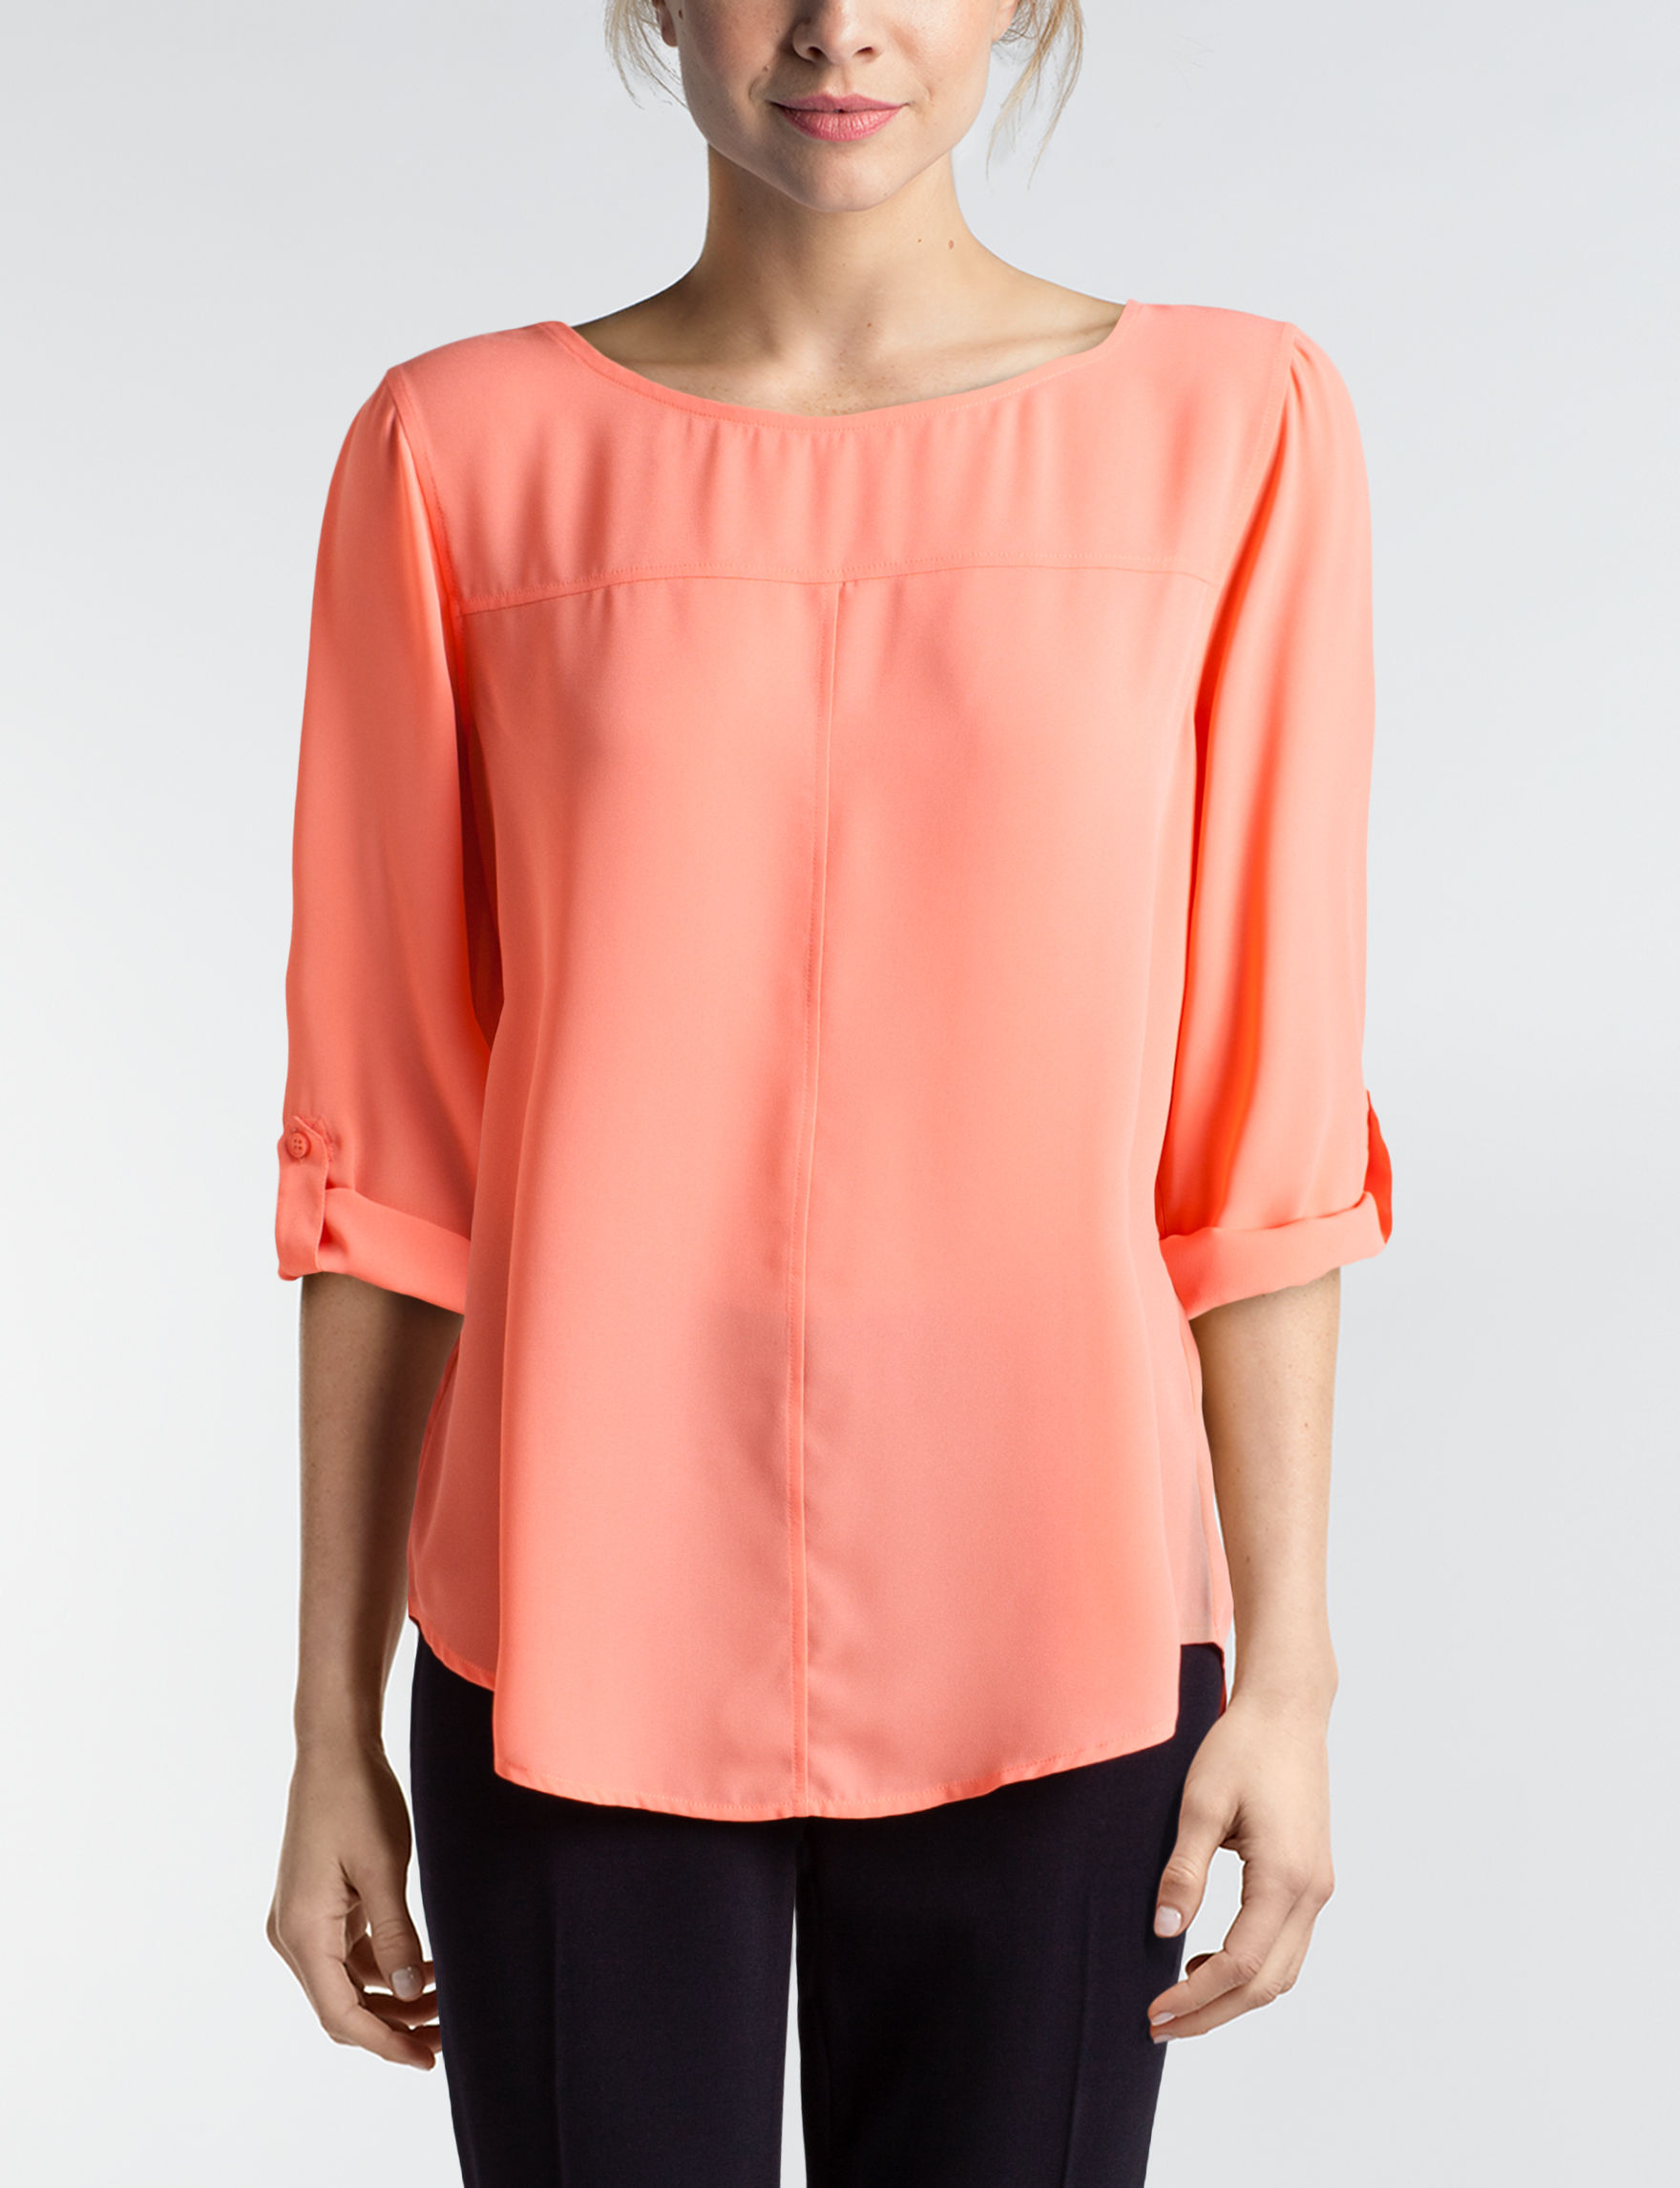 Valerie Stevens Guava Shirts & Blouses